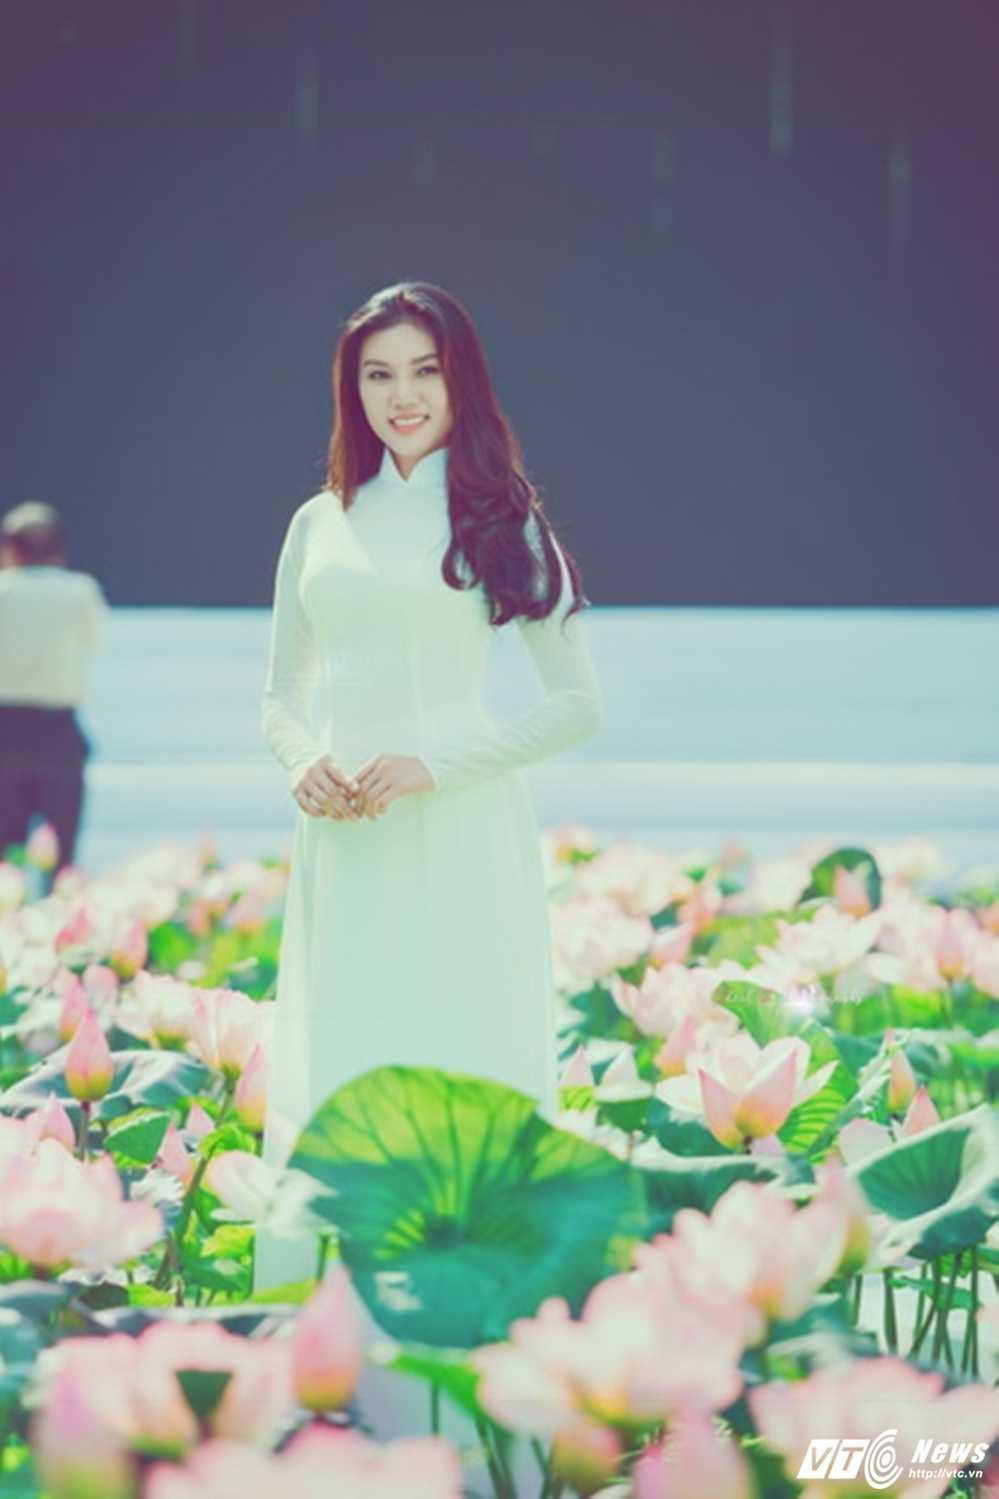 A khoi xinh dep khoe eo thon, dang chuan trong Le hoi ao dai 2017 hinh anh 3